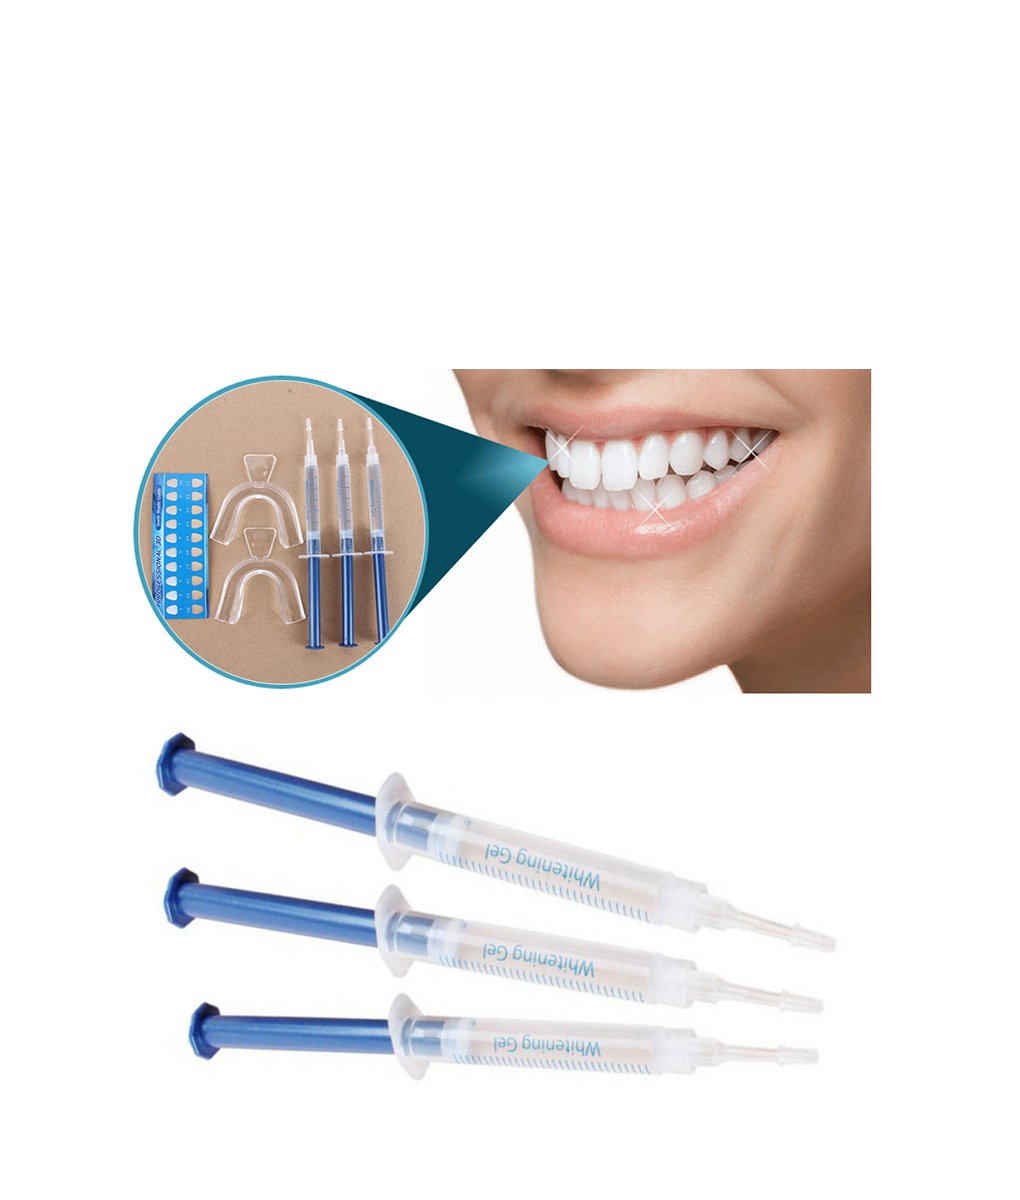 Buy Teeth Whitening Kit Led Teeth Whitening Is Of Very Quality